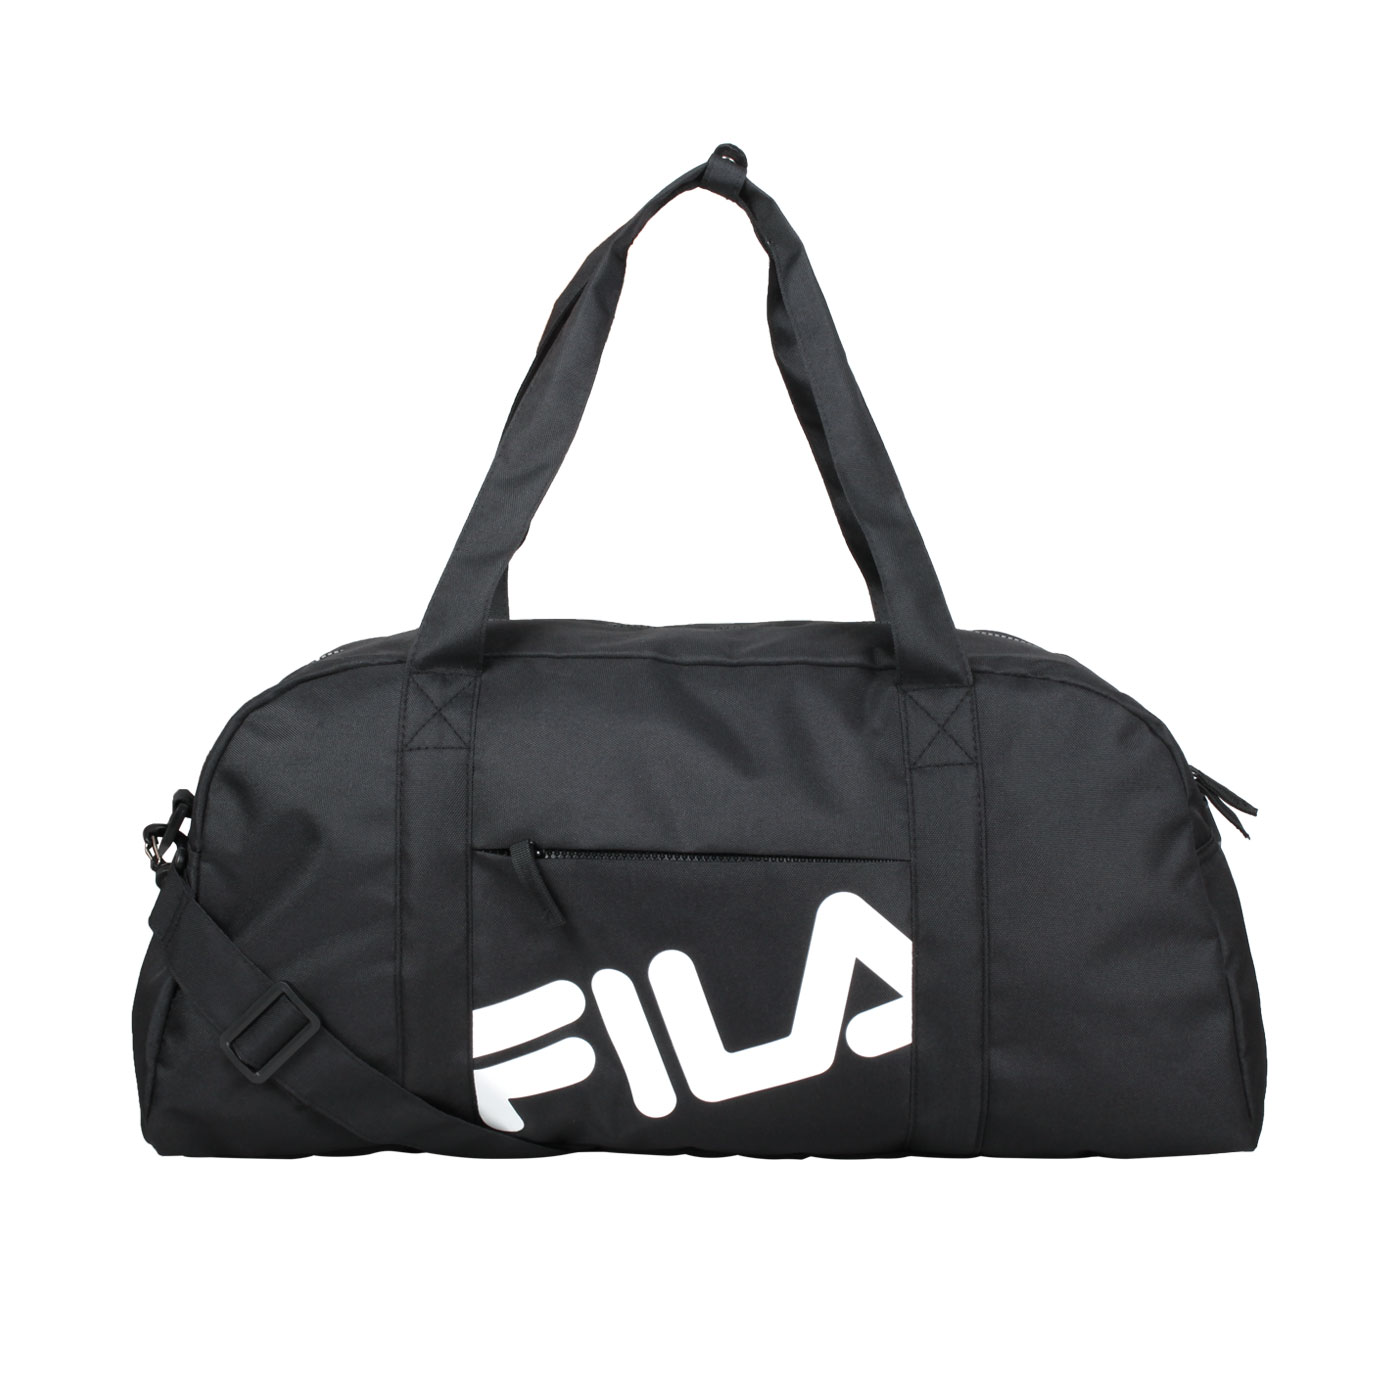 FILA 訓練運動提袋 OTV-3016-BK - 黑白